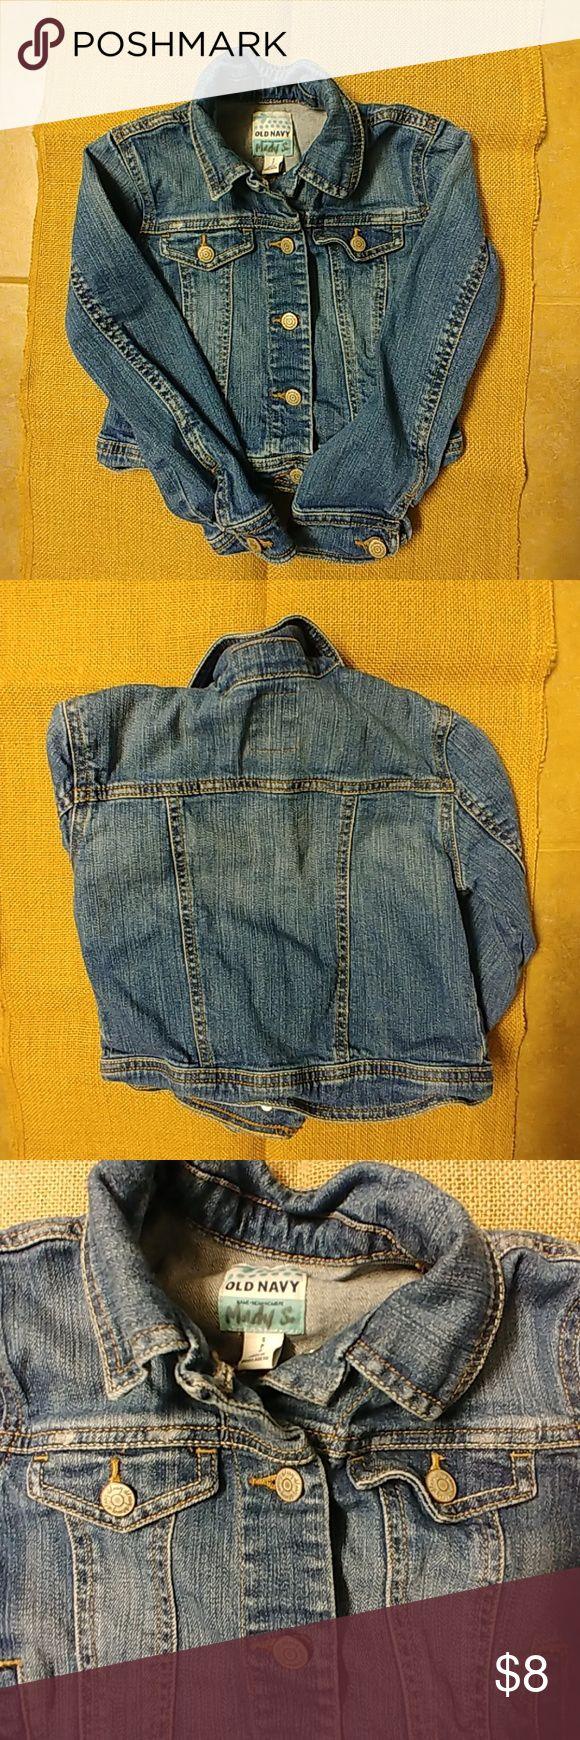 Girls' Old Navy Jean Jacket Gently Used Condition. Old Navy Jean Jacket. Size Small (Girls') Old Navy Jackets & Coats Jean Jackets